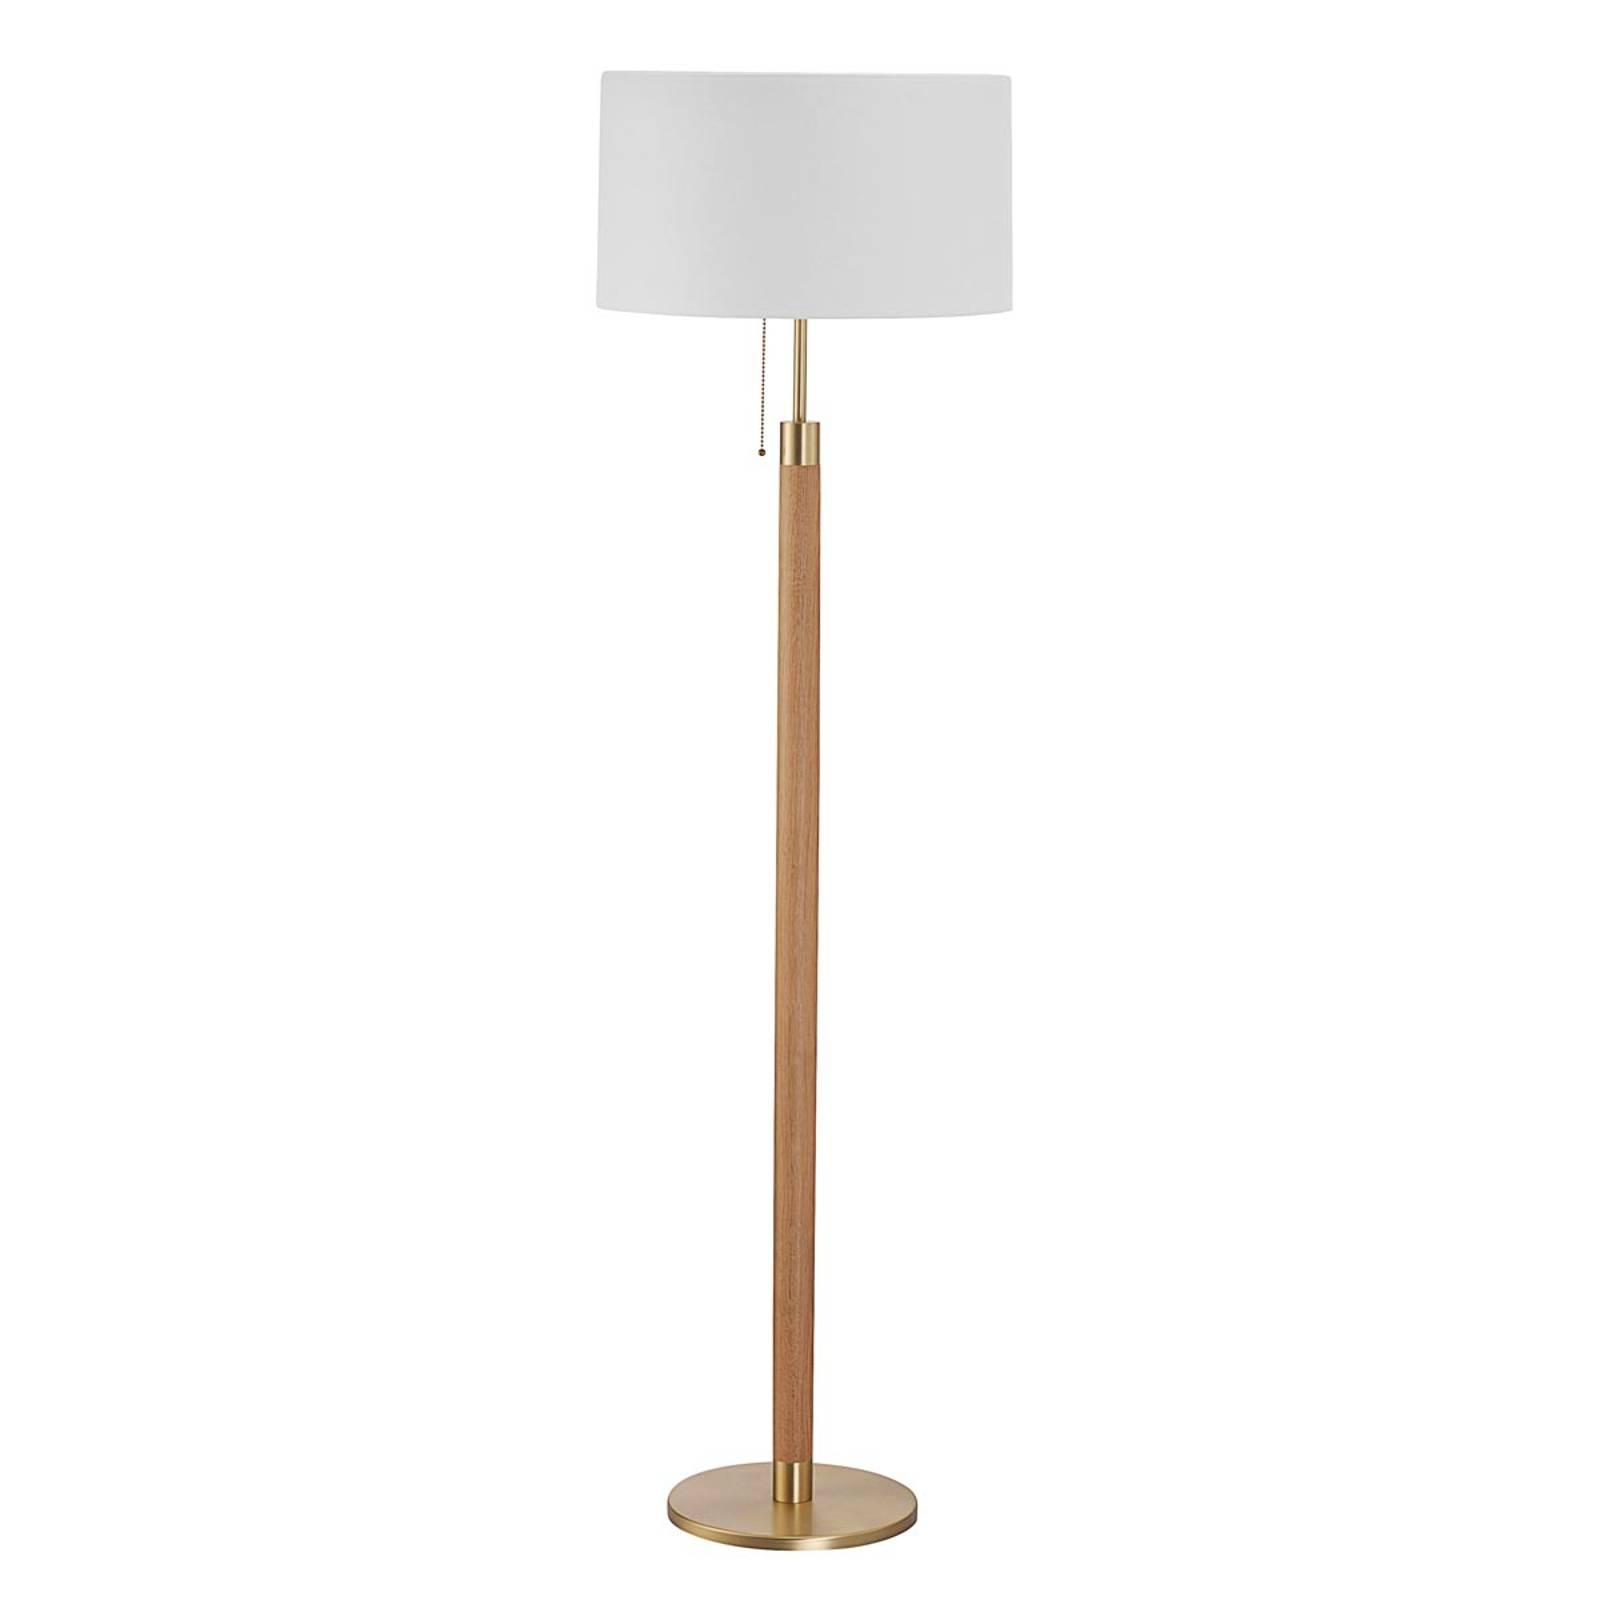 Houten vloerlamp Lignum met sits-kap, messing